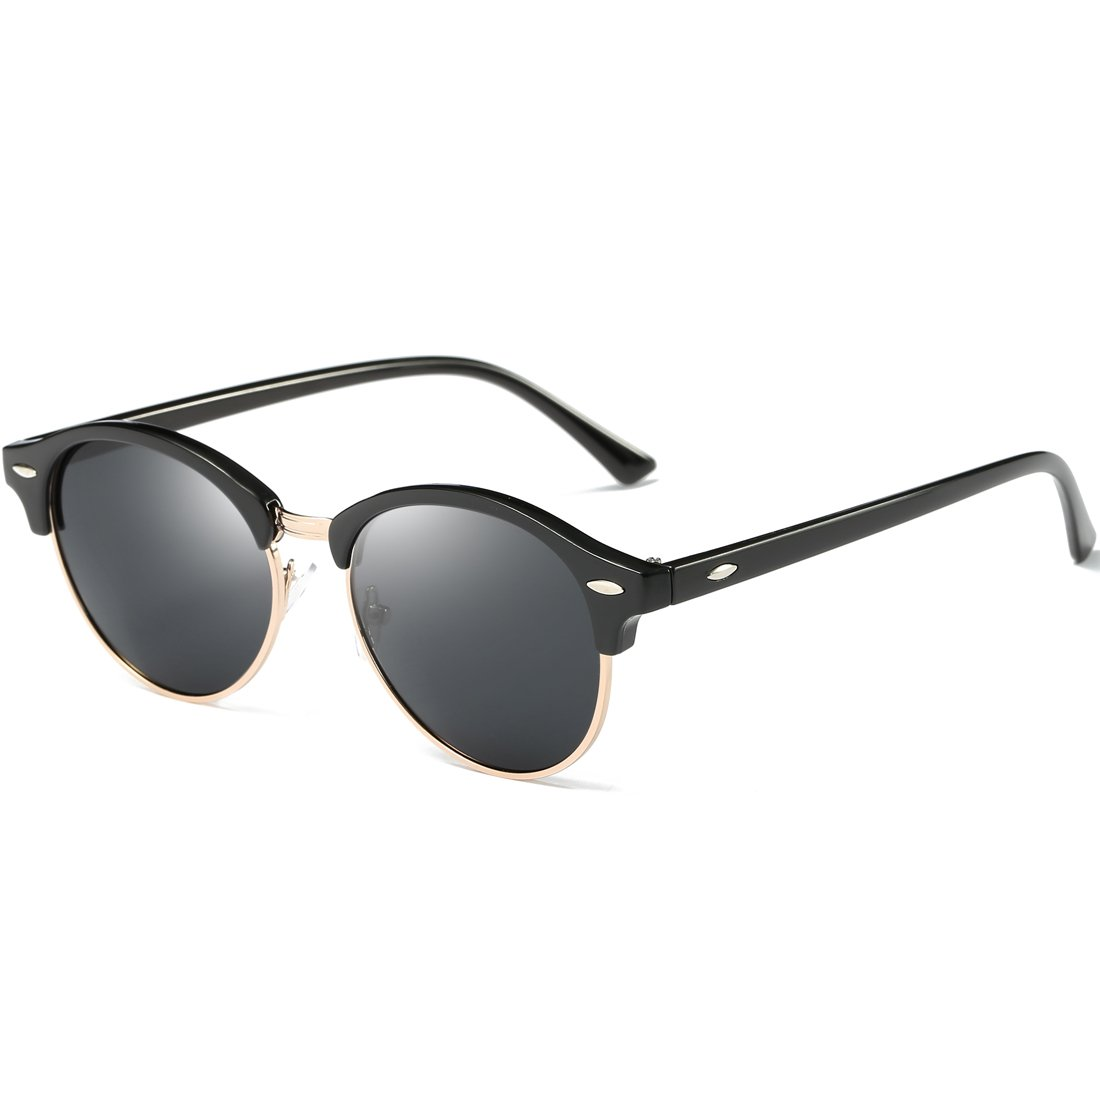 Joopin Semi Rimless Polarized Sunglasses Women Men Retro Brand Sun Glasses as the pictures) H9041-09